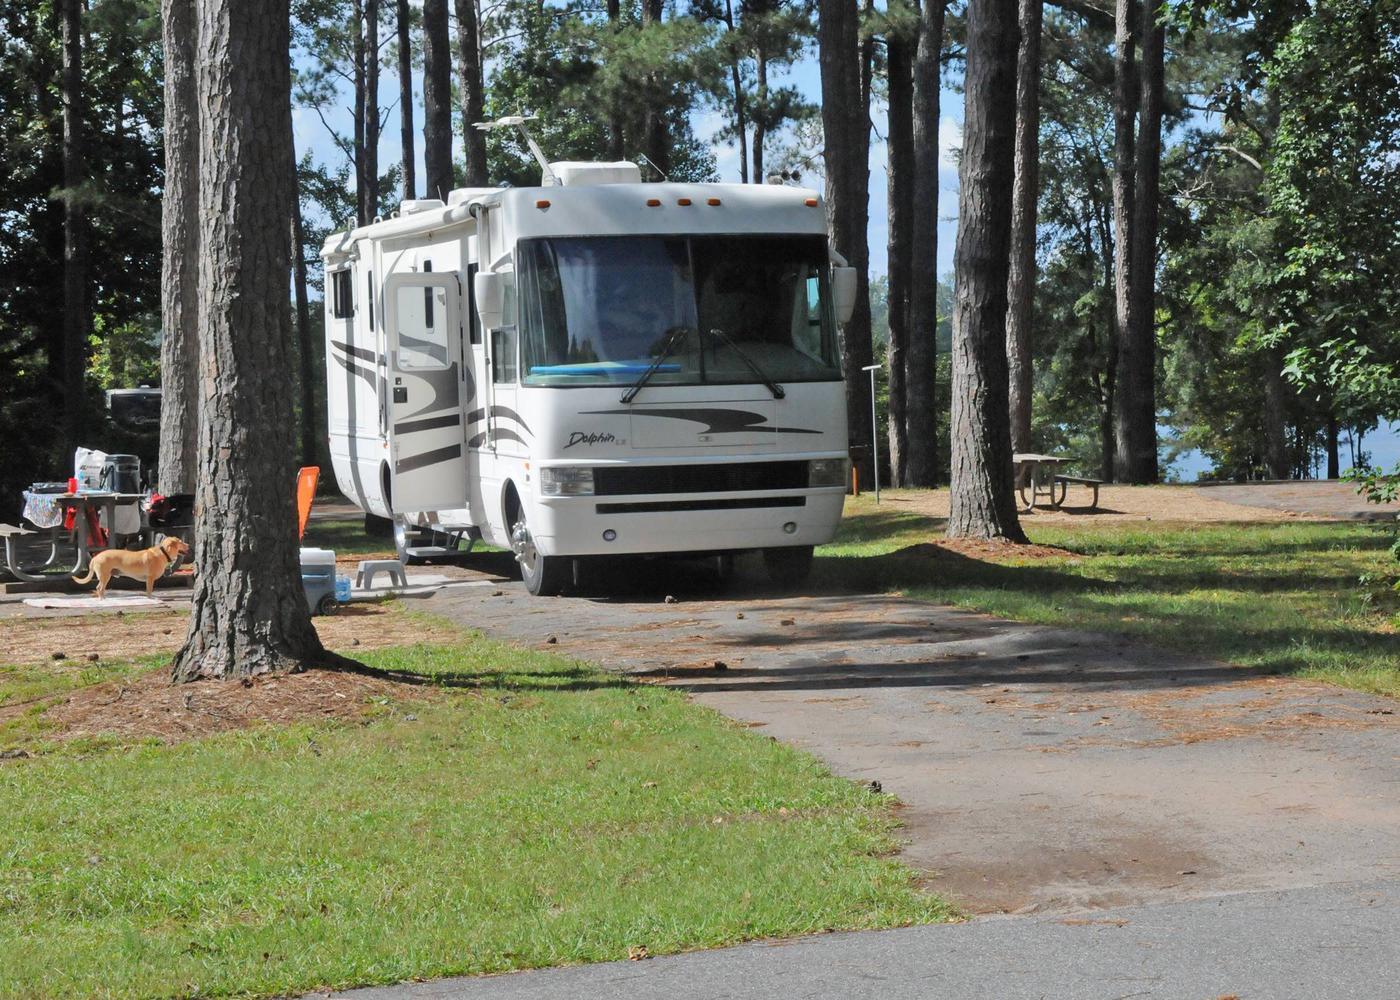 Victoria Campground Site 29